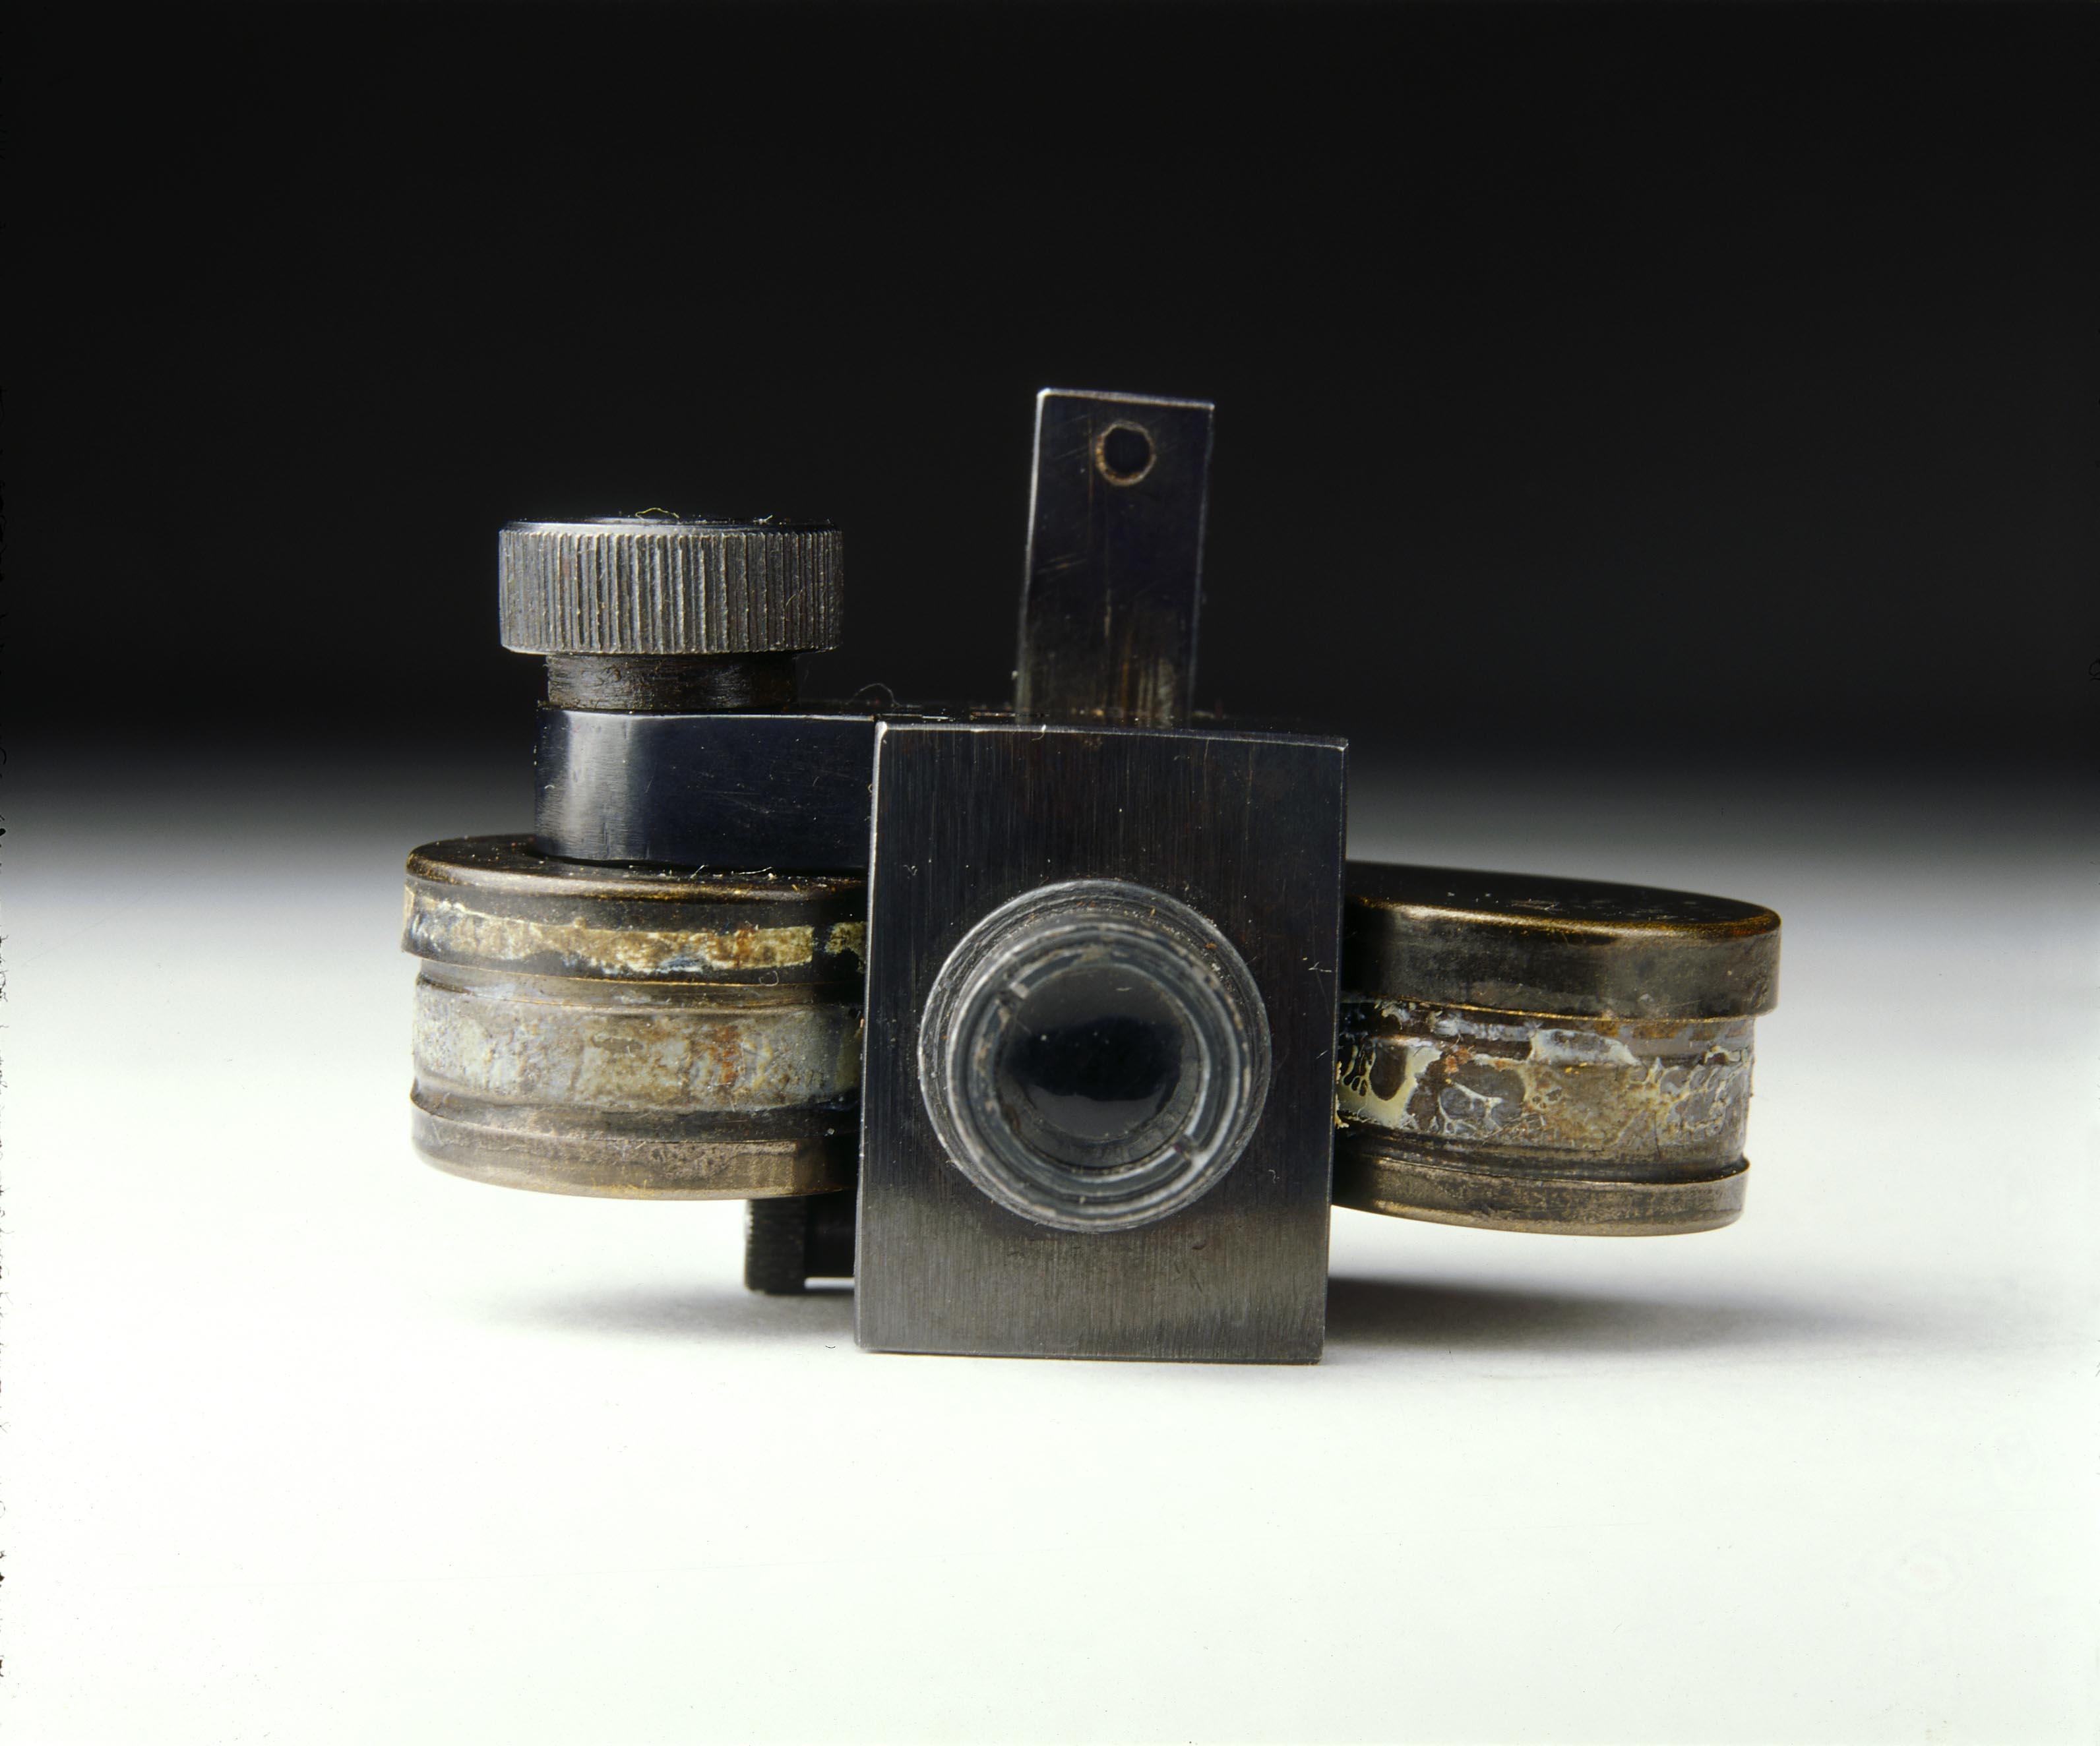 Microdot Camera